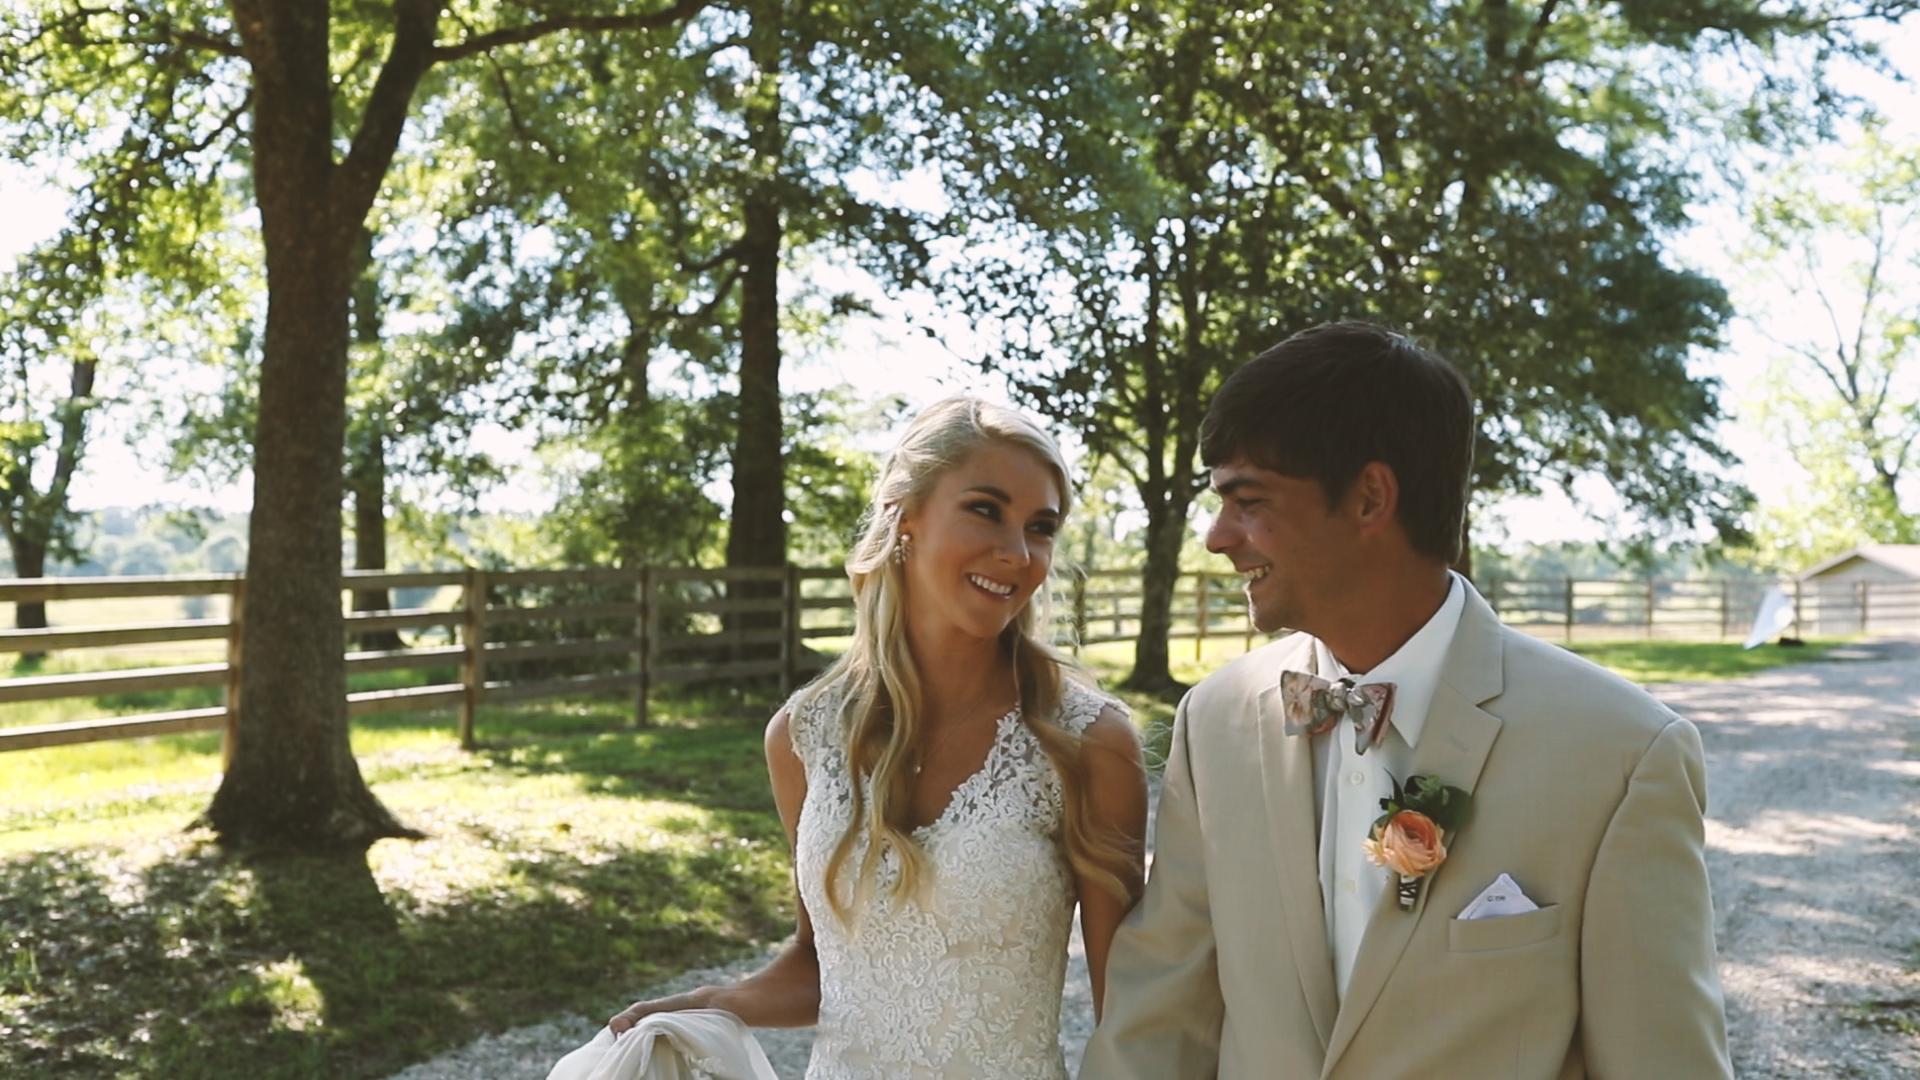 Engagement Shoot - Bride Film